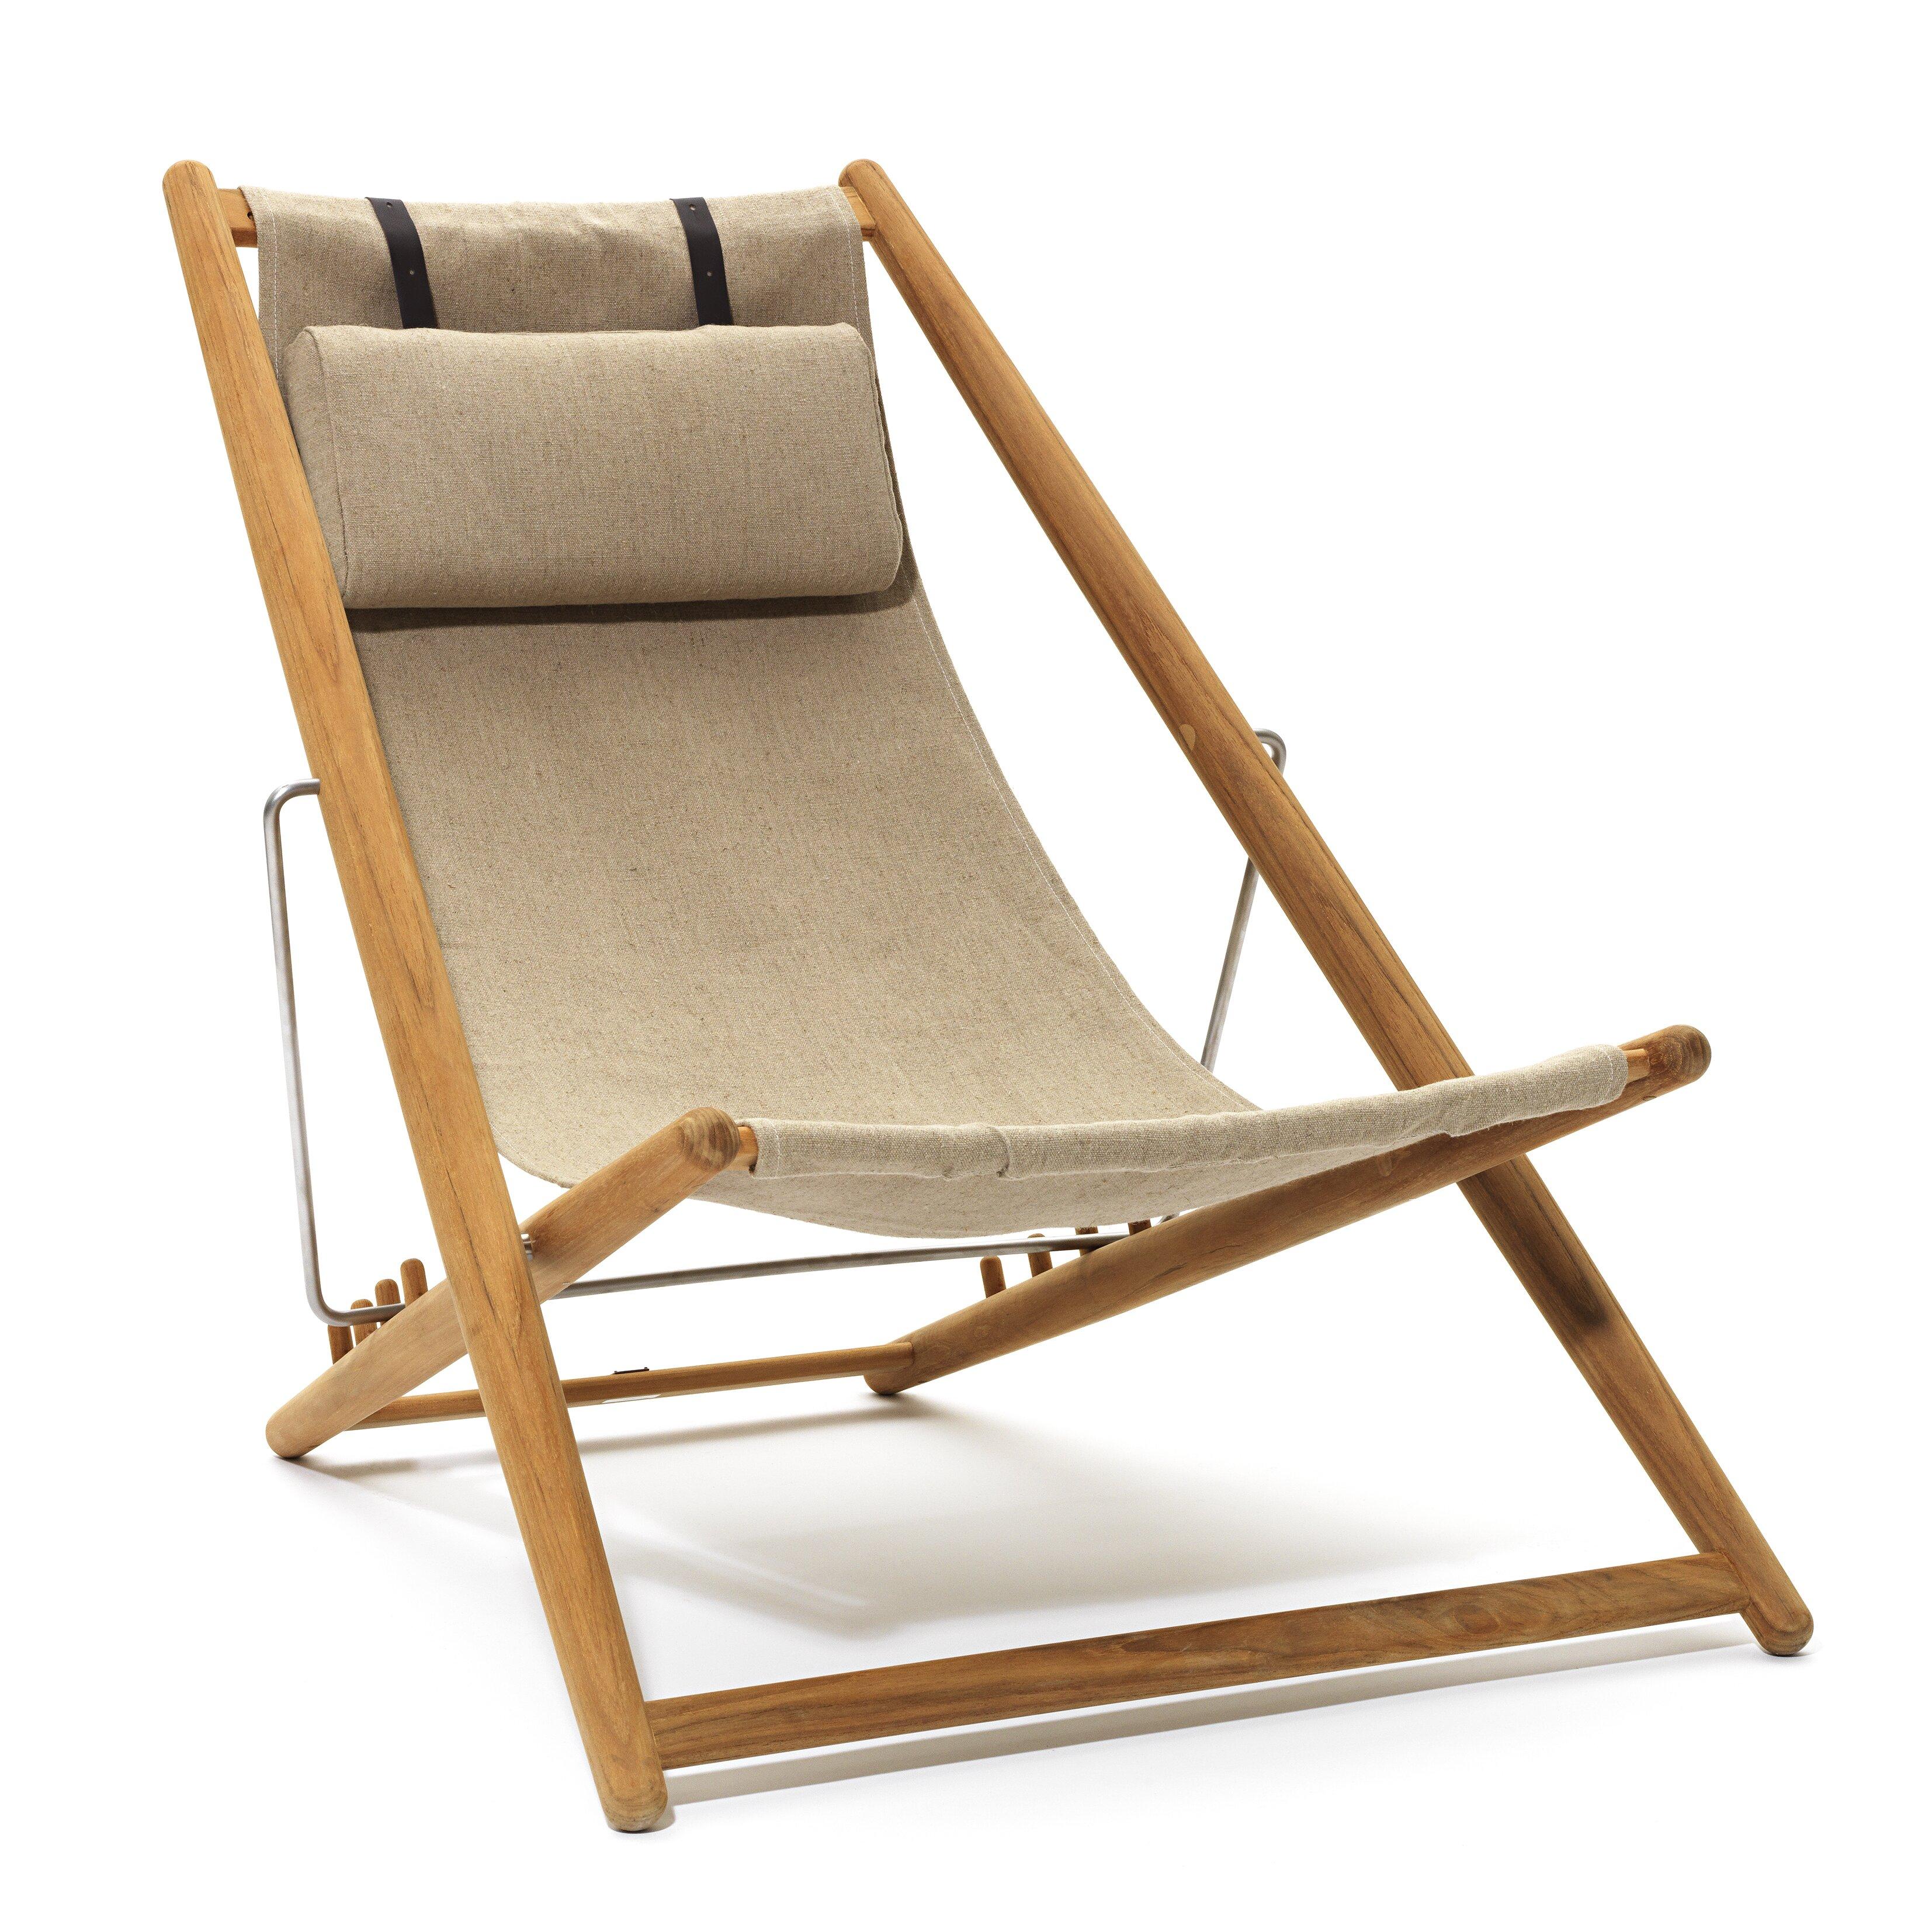 Skargaarden h55 zero gravity chair reviews wayfair for Chair zero review